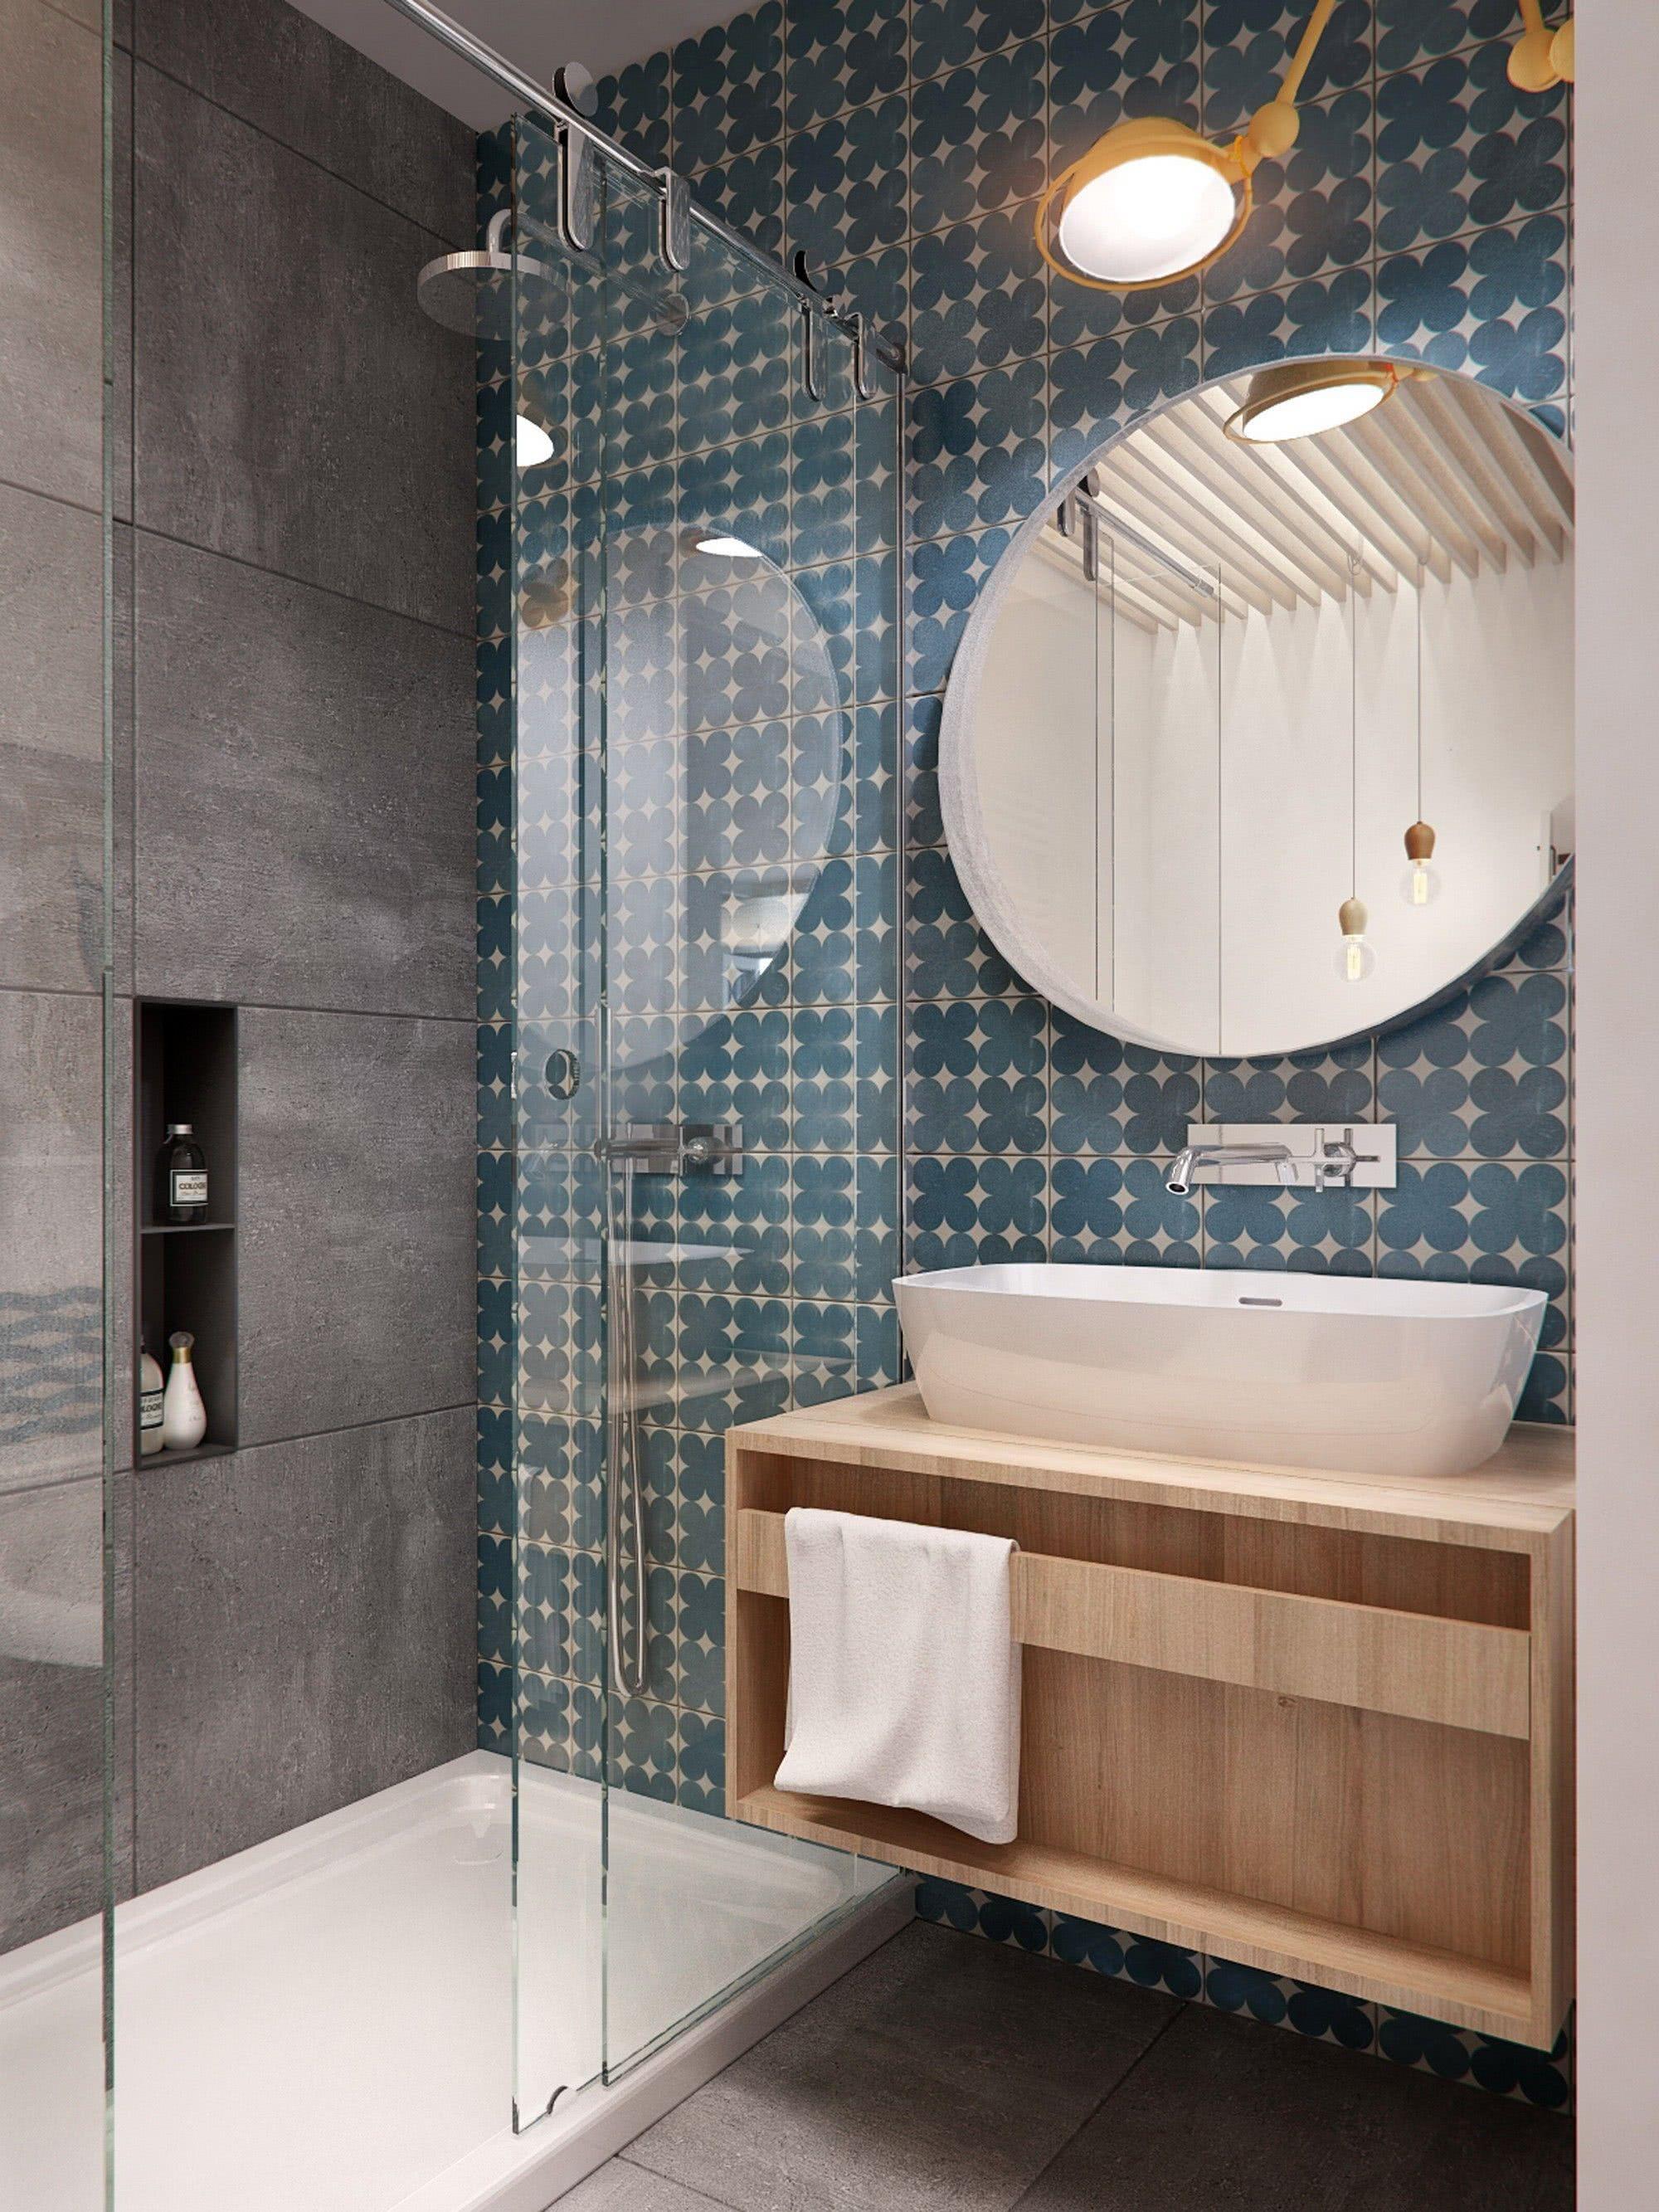 100 banheiros simples e pequenos inspiradores fotos for Miroir zellige